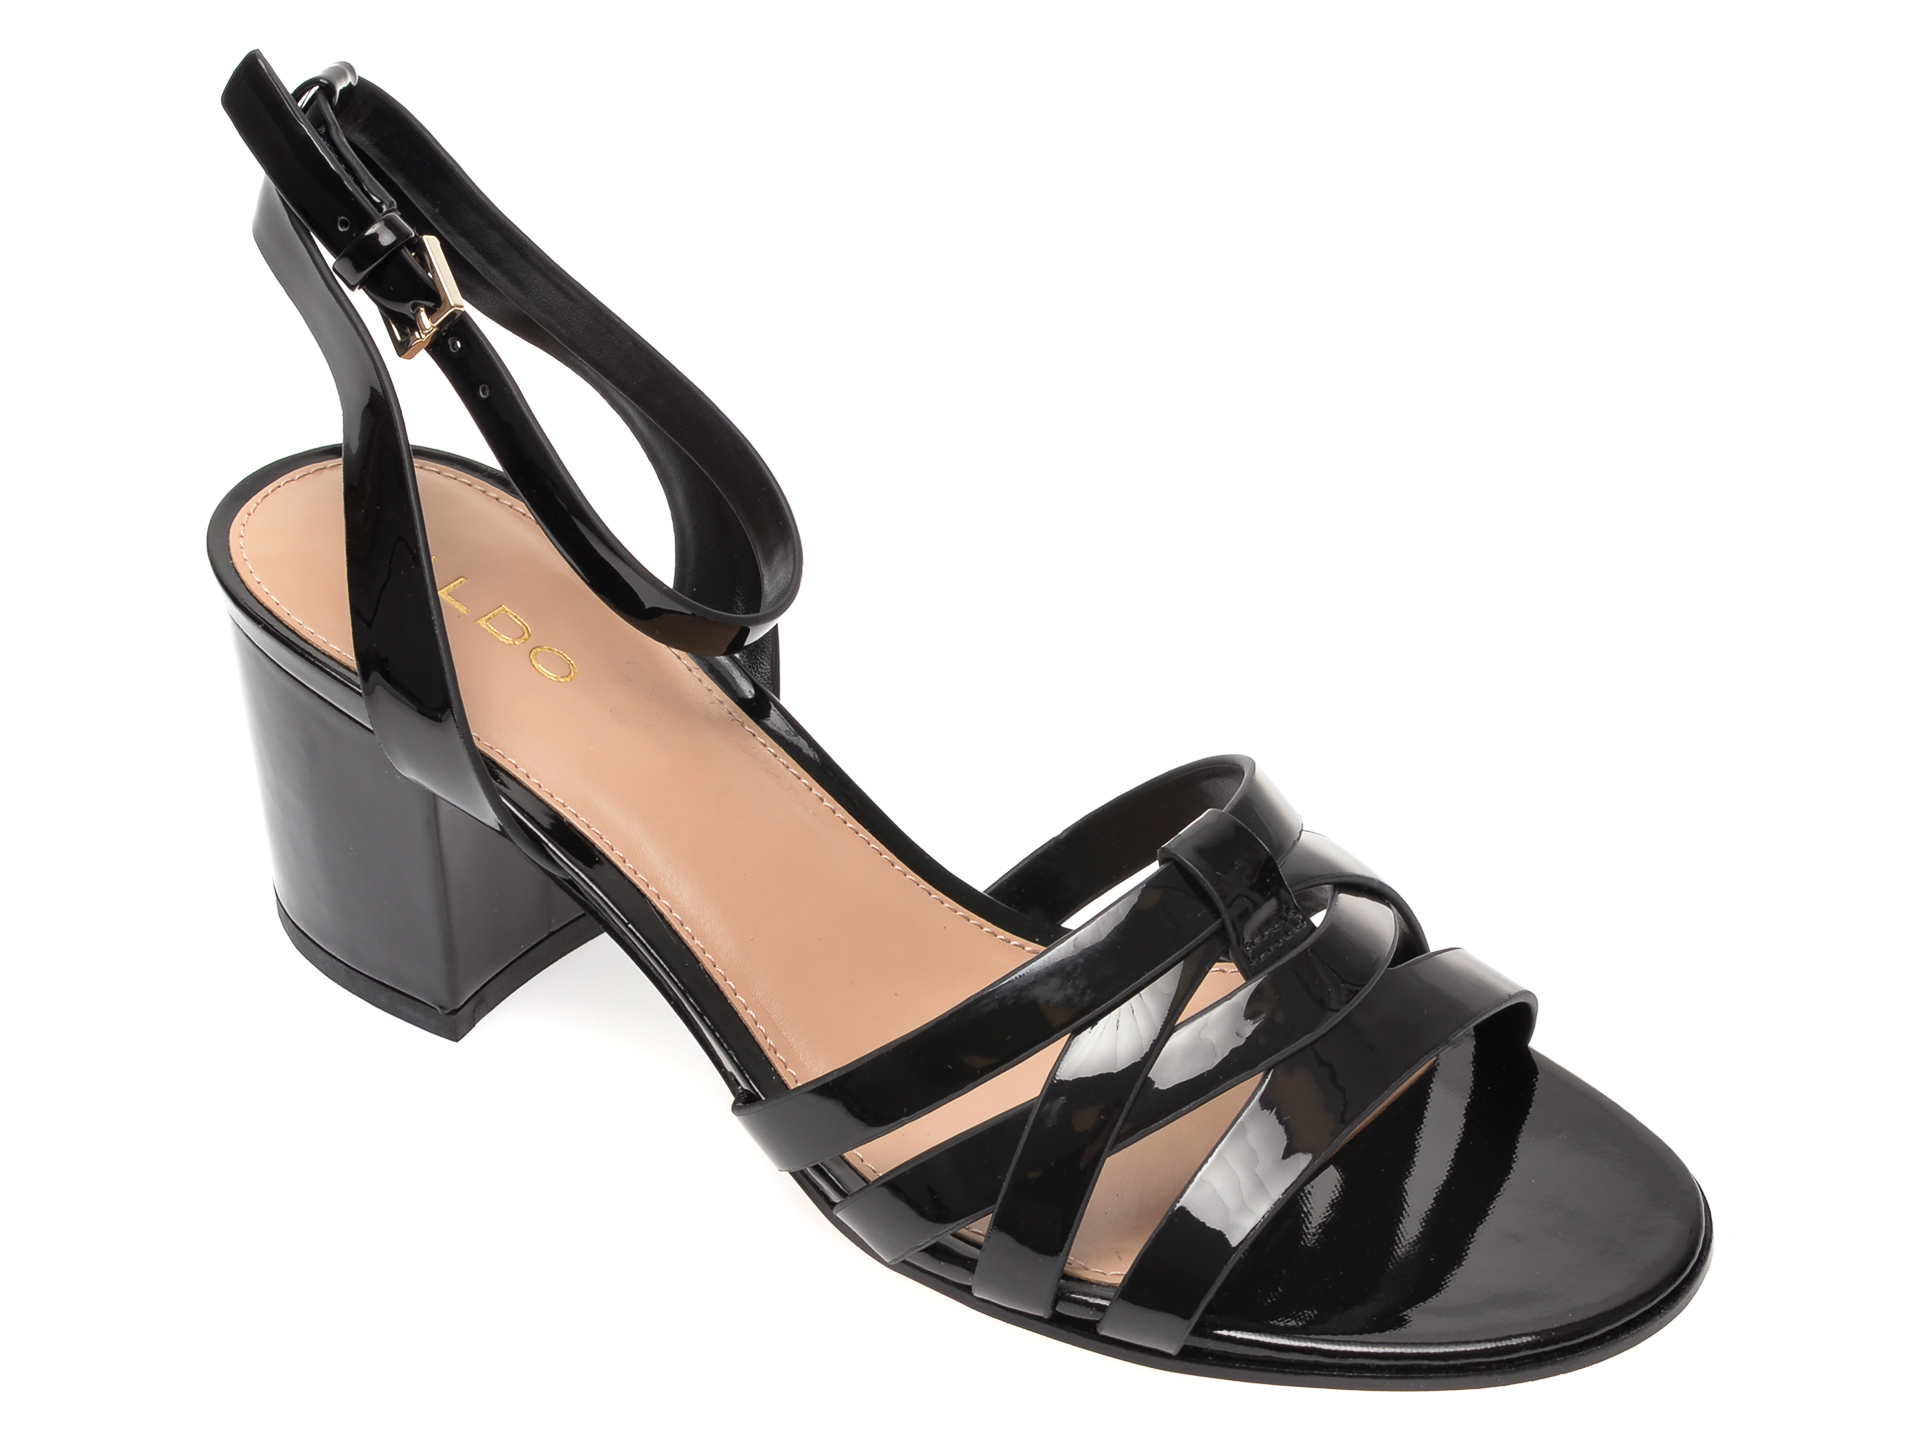 Sandale ALDO negre, Hillia001, din piele ecologica imagine otter.ro 2021